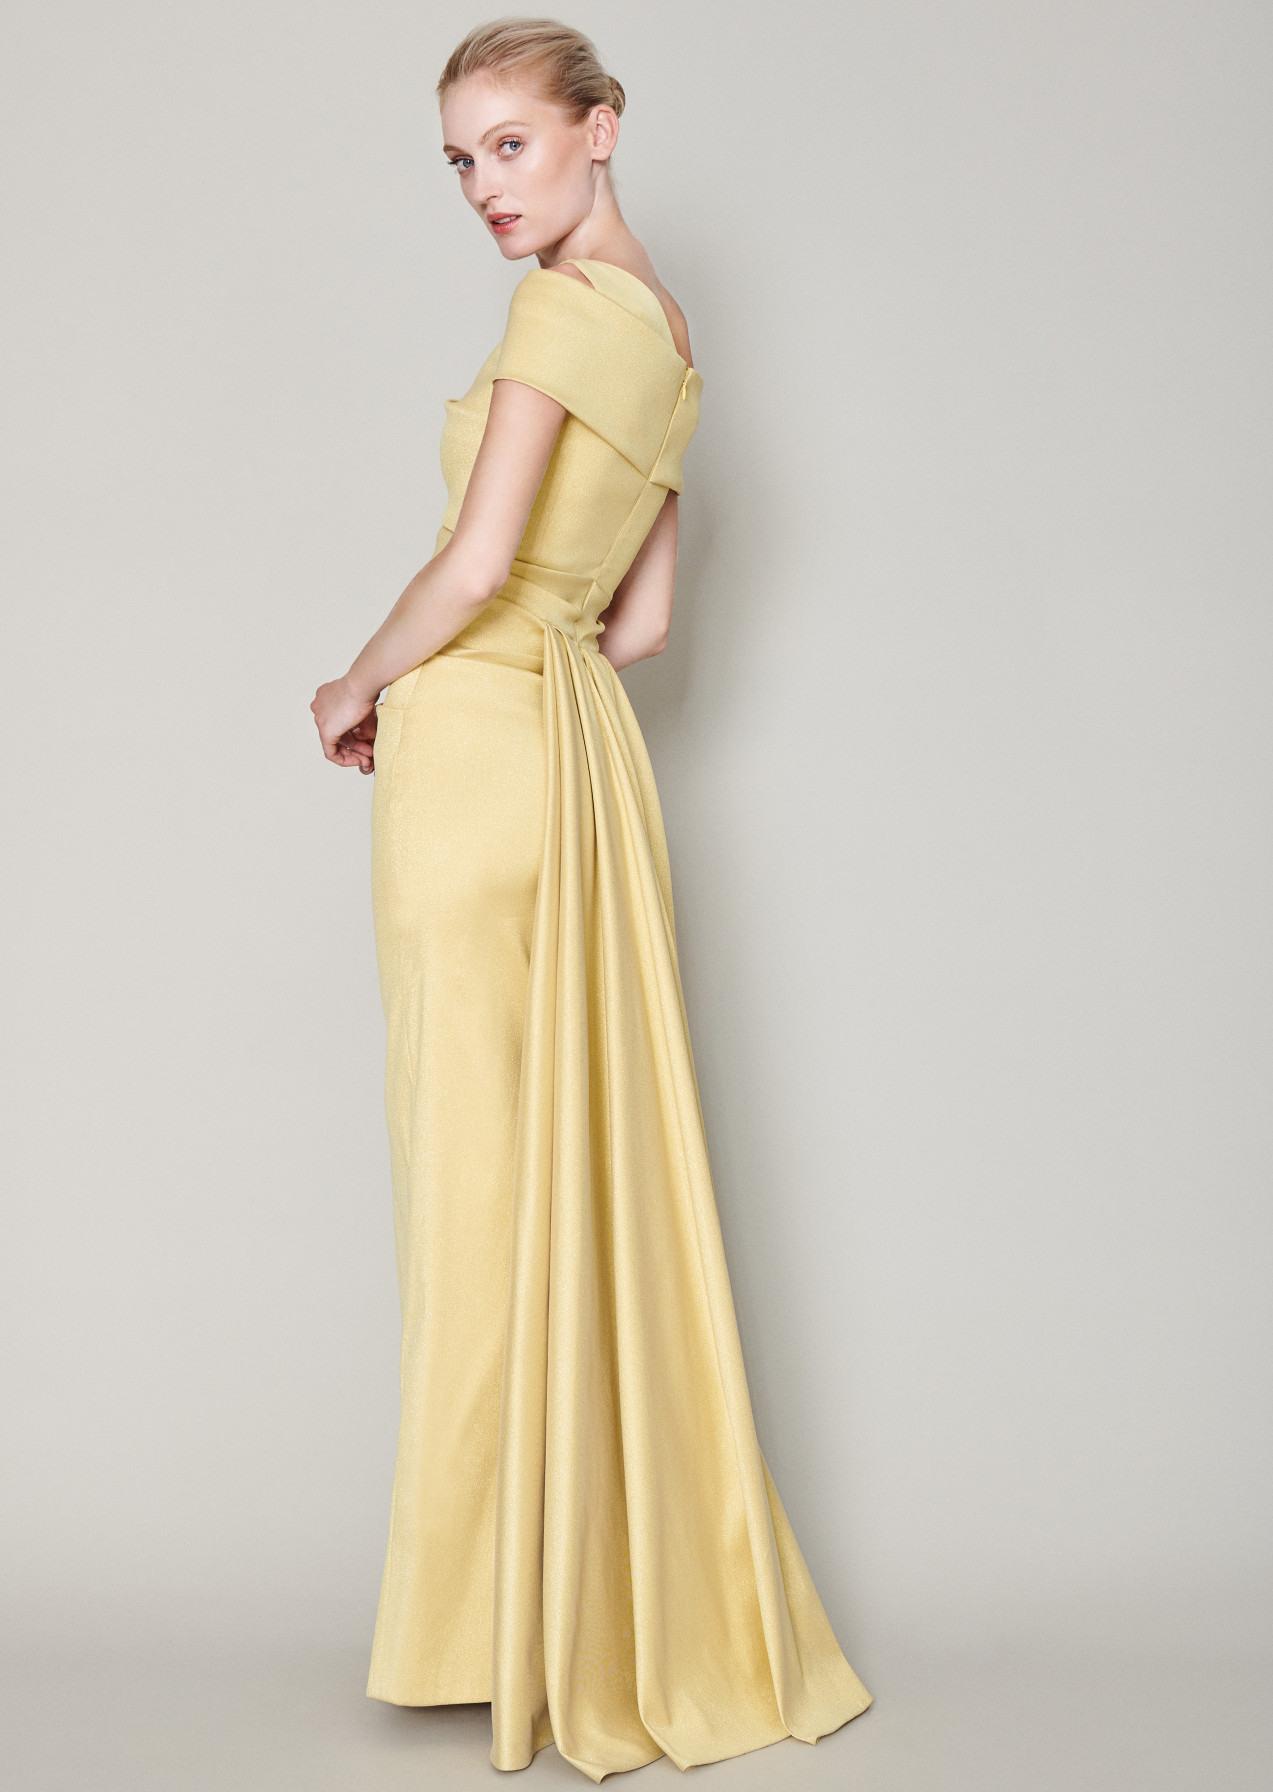 Formal Großartig Abendkleid Besonders Stylish17 Einfach Abendkleid Besonders Design